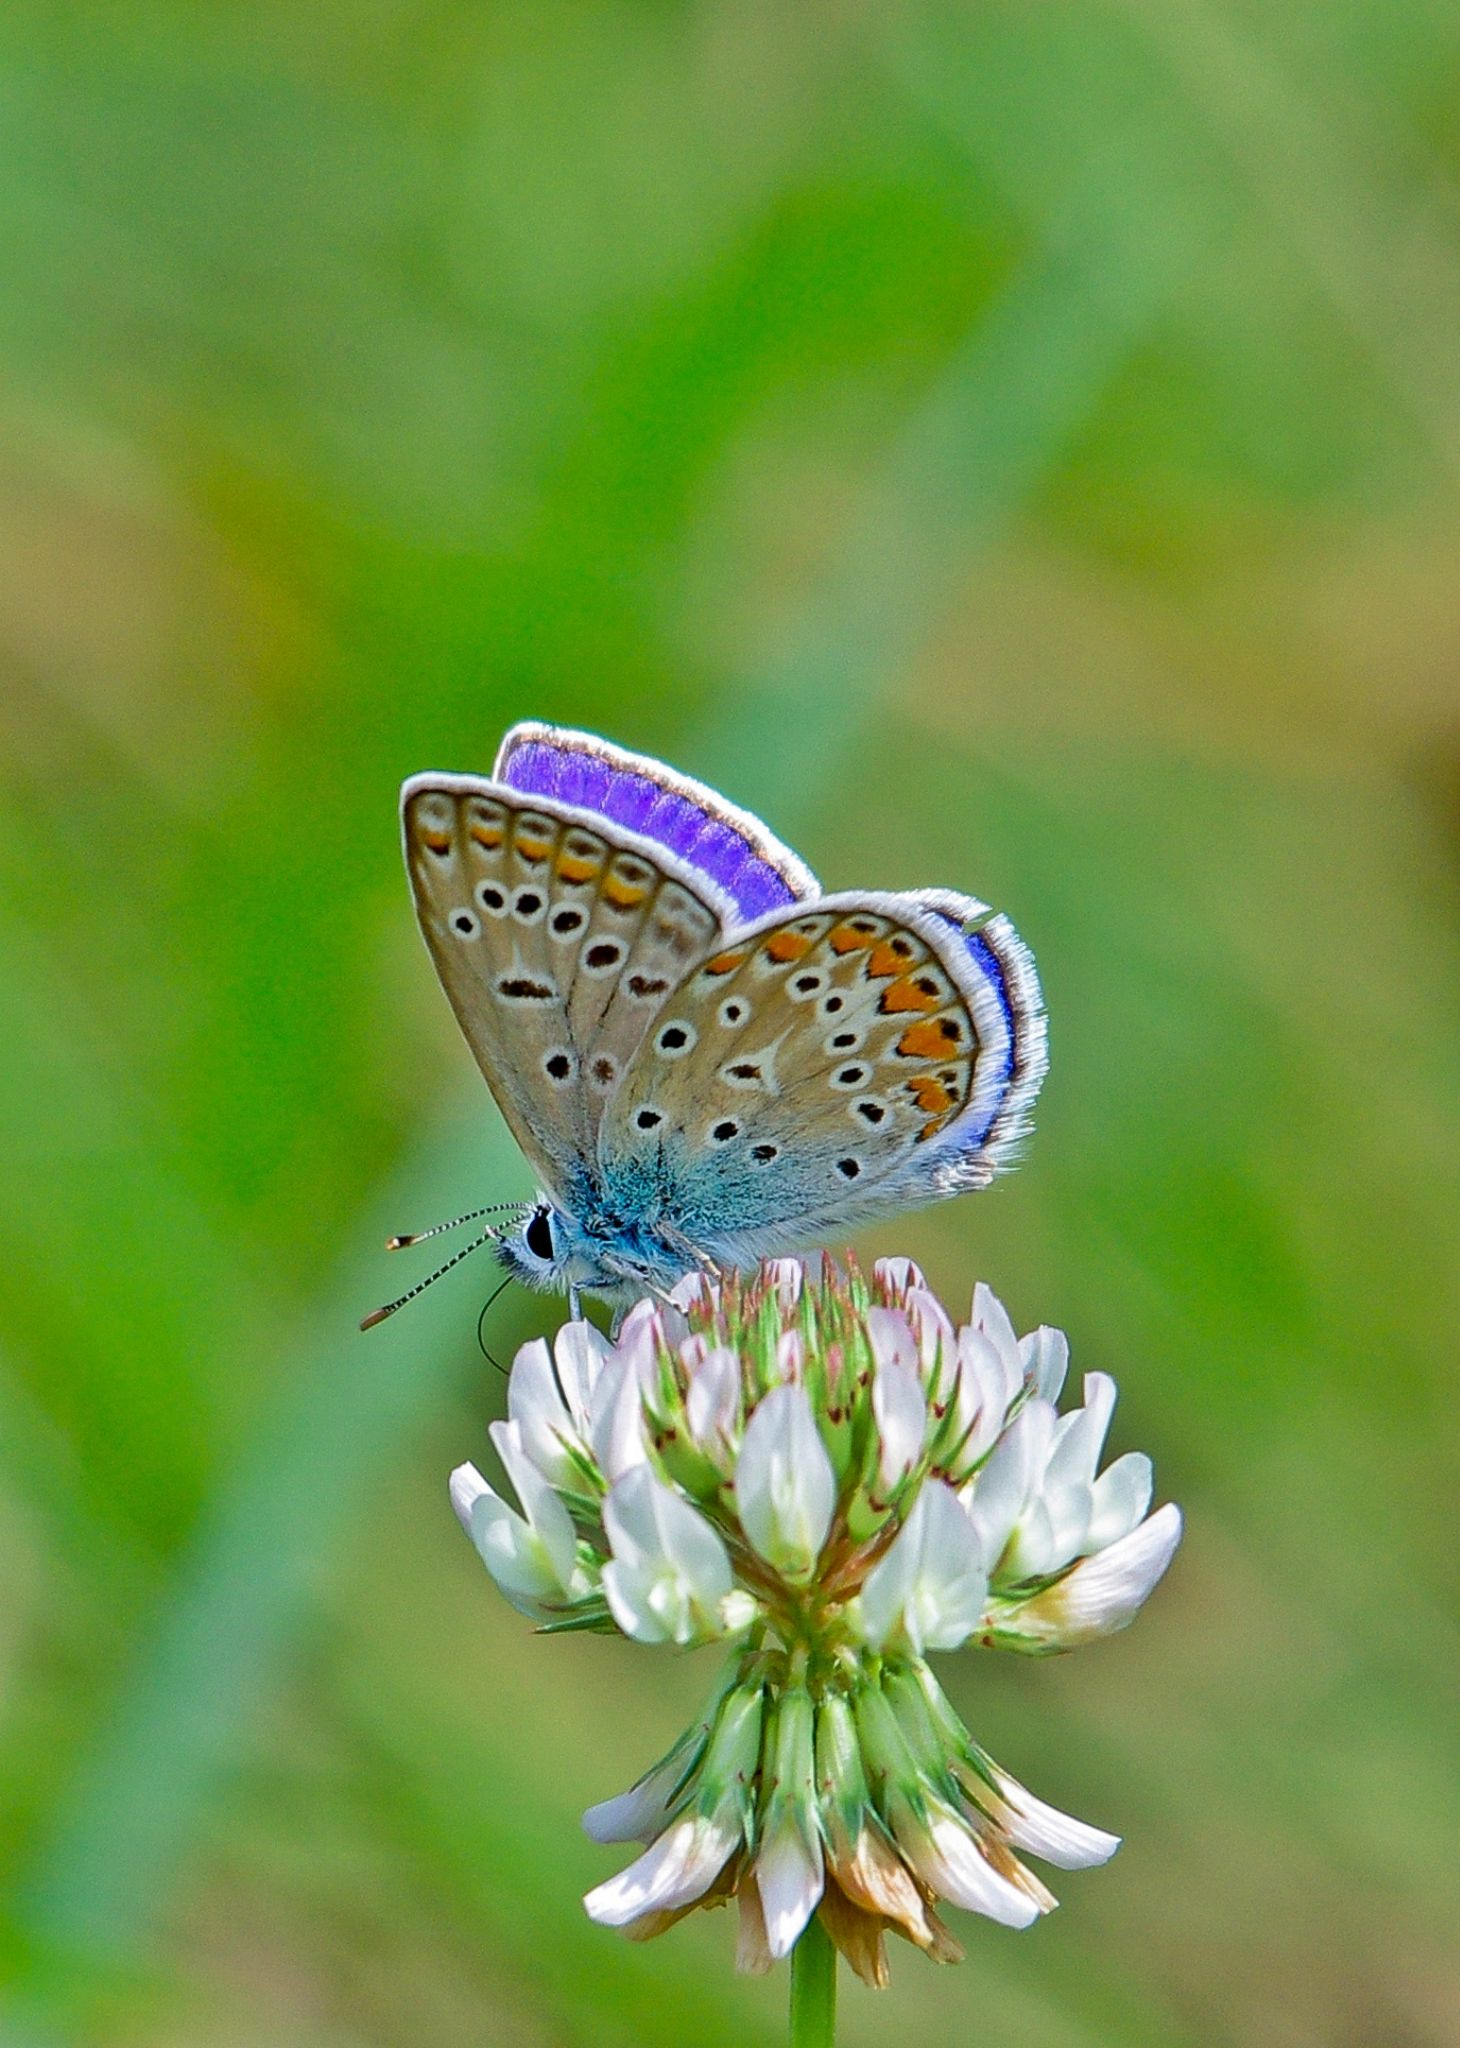 Butterfly IV by Zoran Rudec